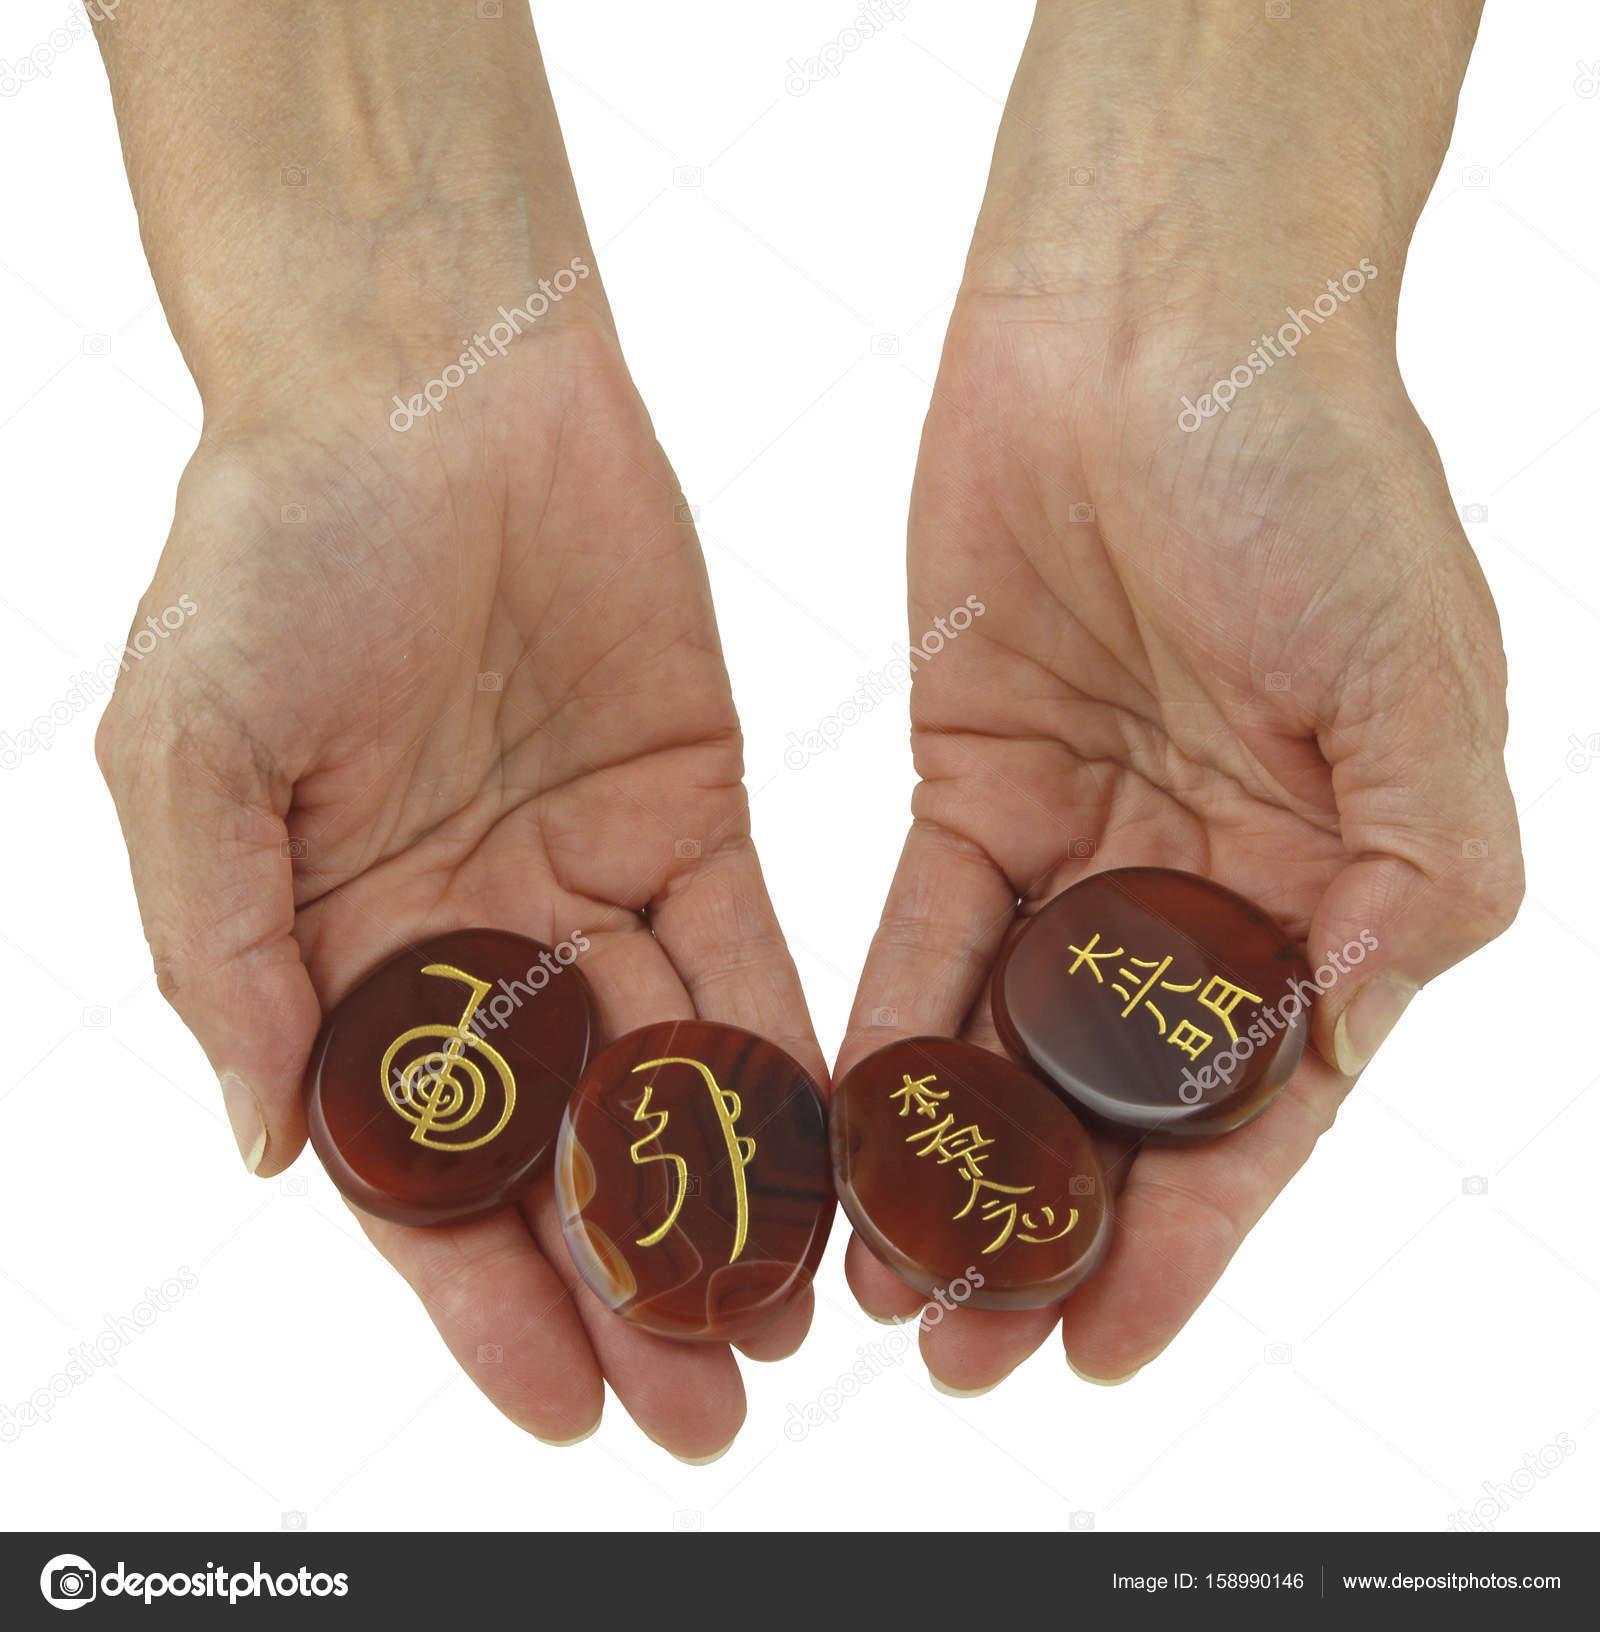 Reiki symbols etched onto polished carnelian stones stock photo reiki symbols etched onto polished carnelian stones stock photo buycottarizona Images